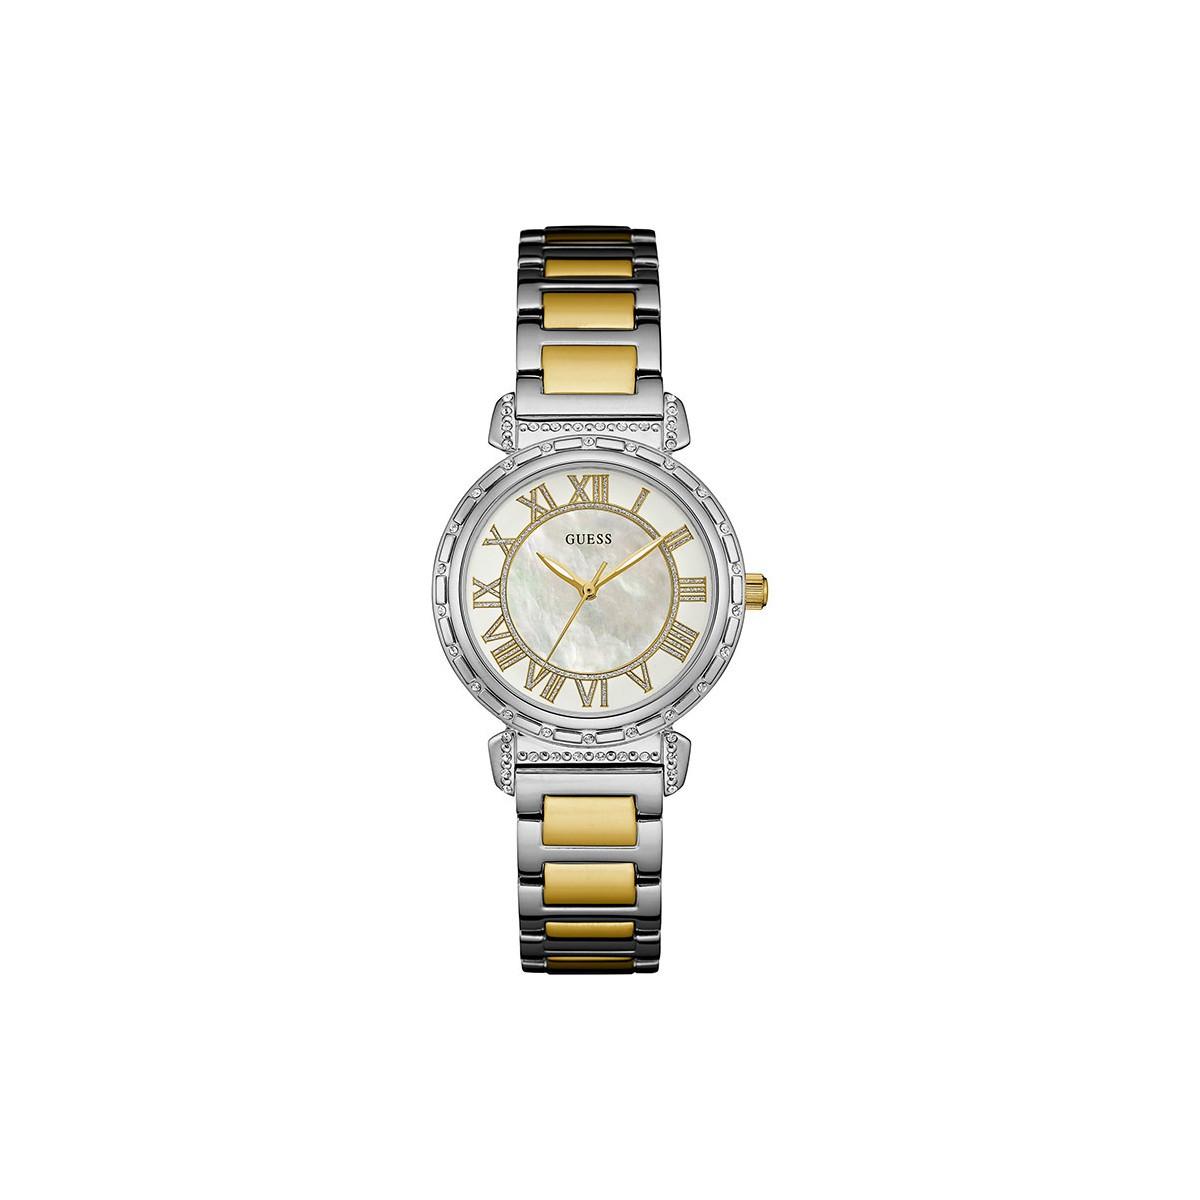 https://www.gaberjoyeria.com/3945-thickbox_default/reloj-guess-w0831l3.jpg